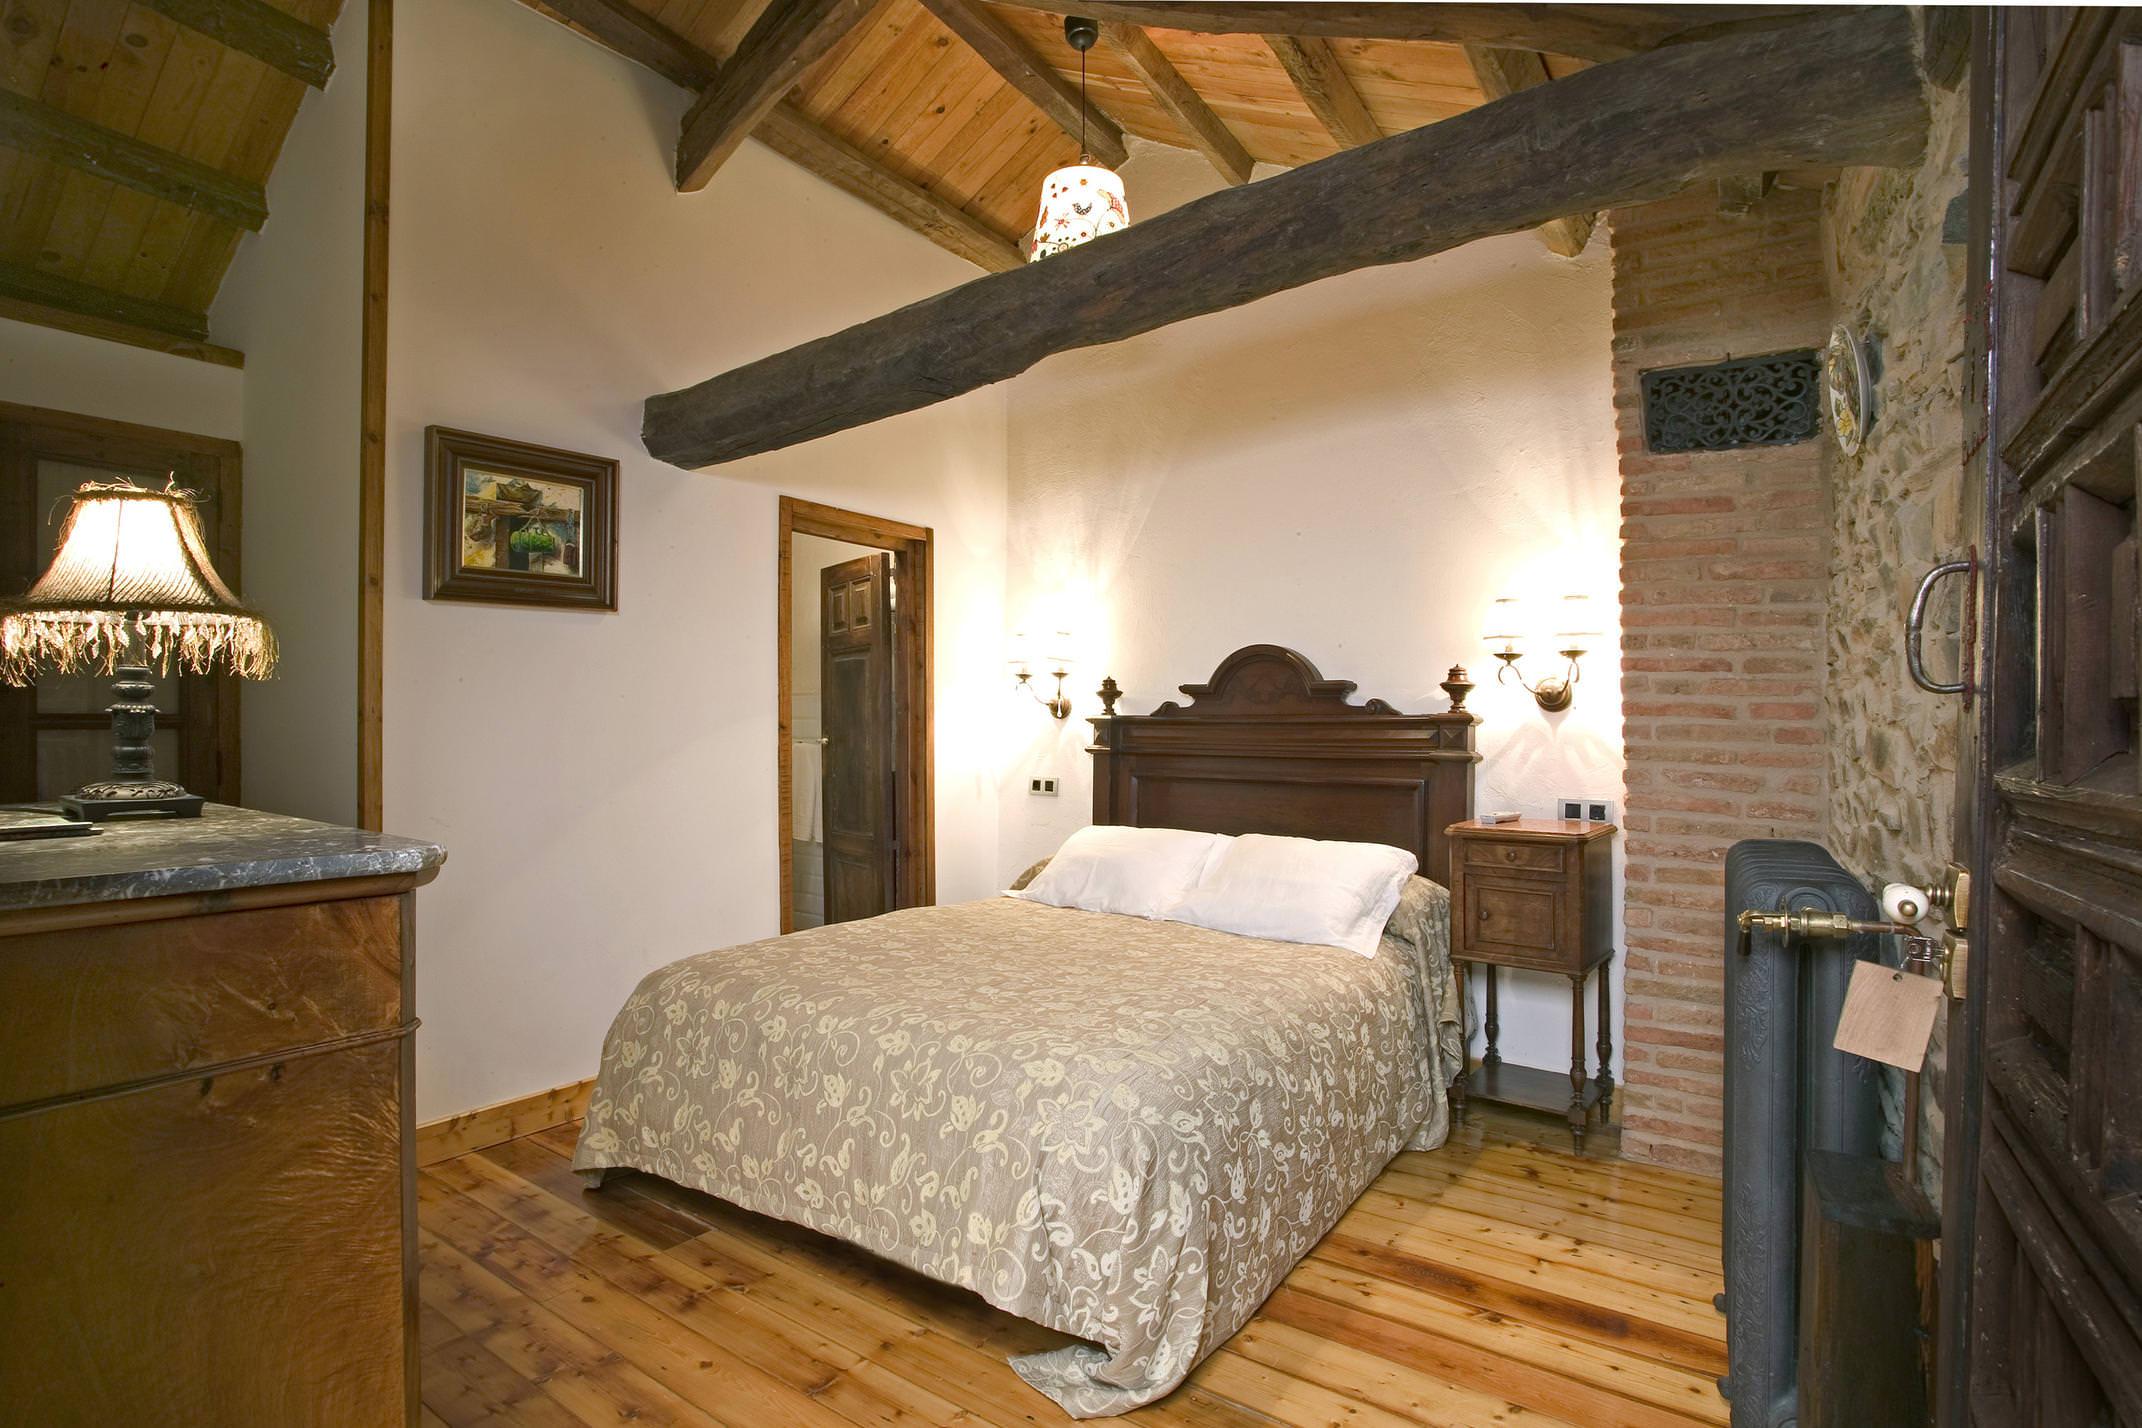 Spain leon camino santiago hosteria camino double room c camino